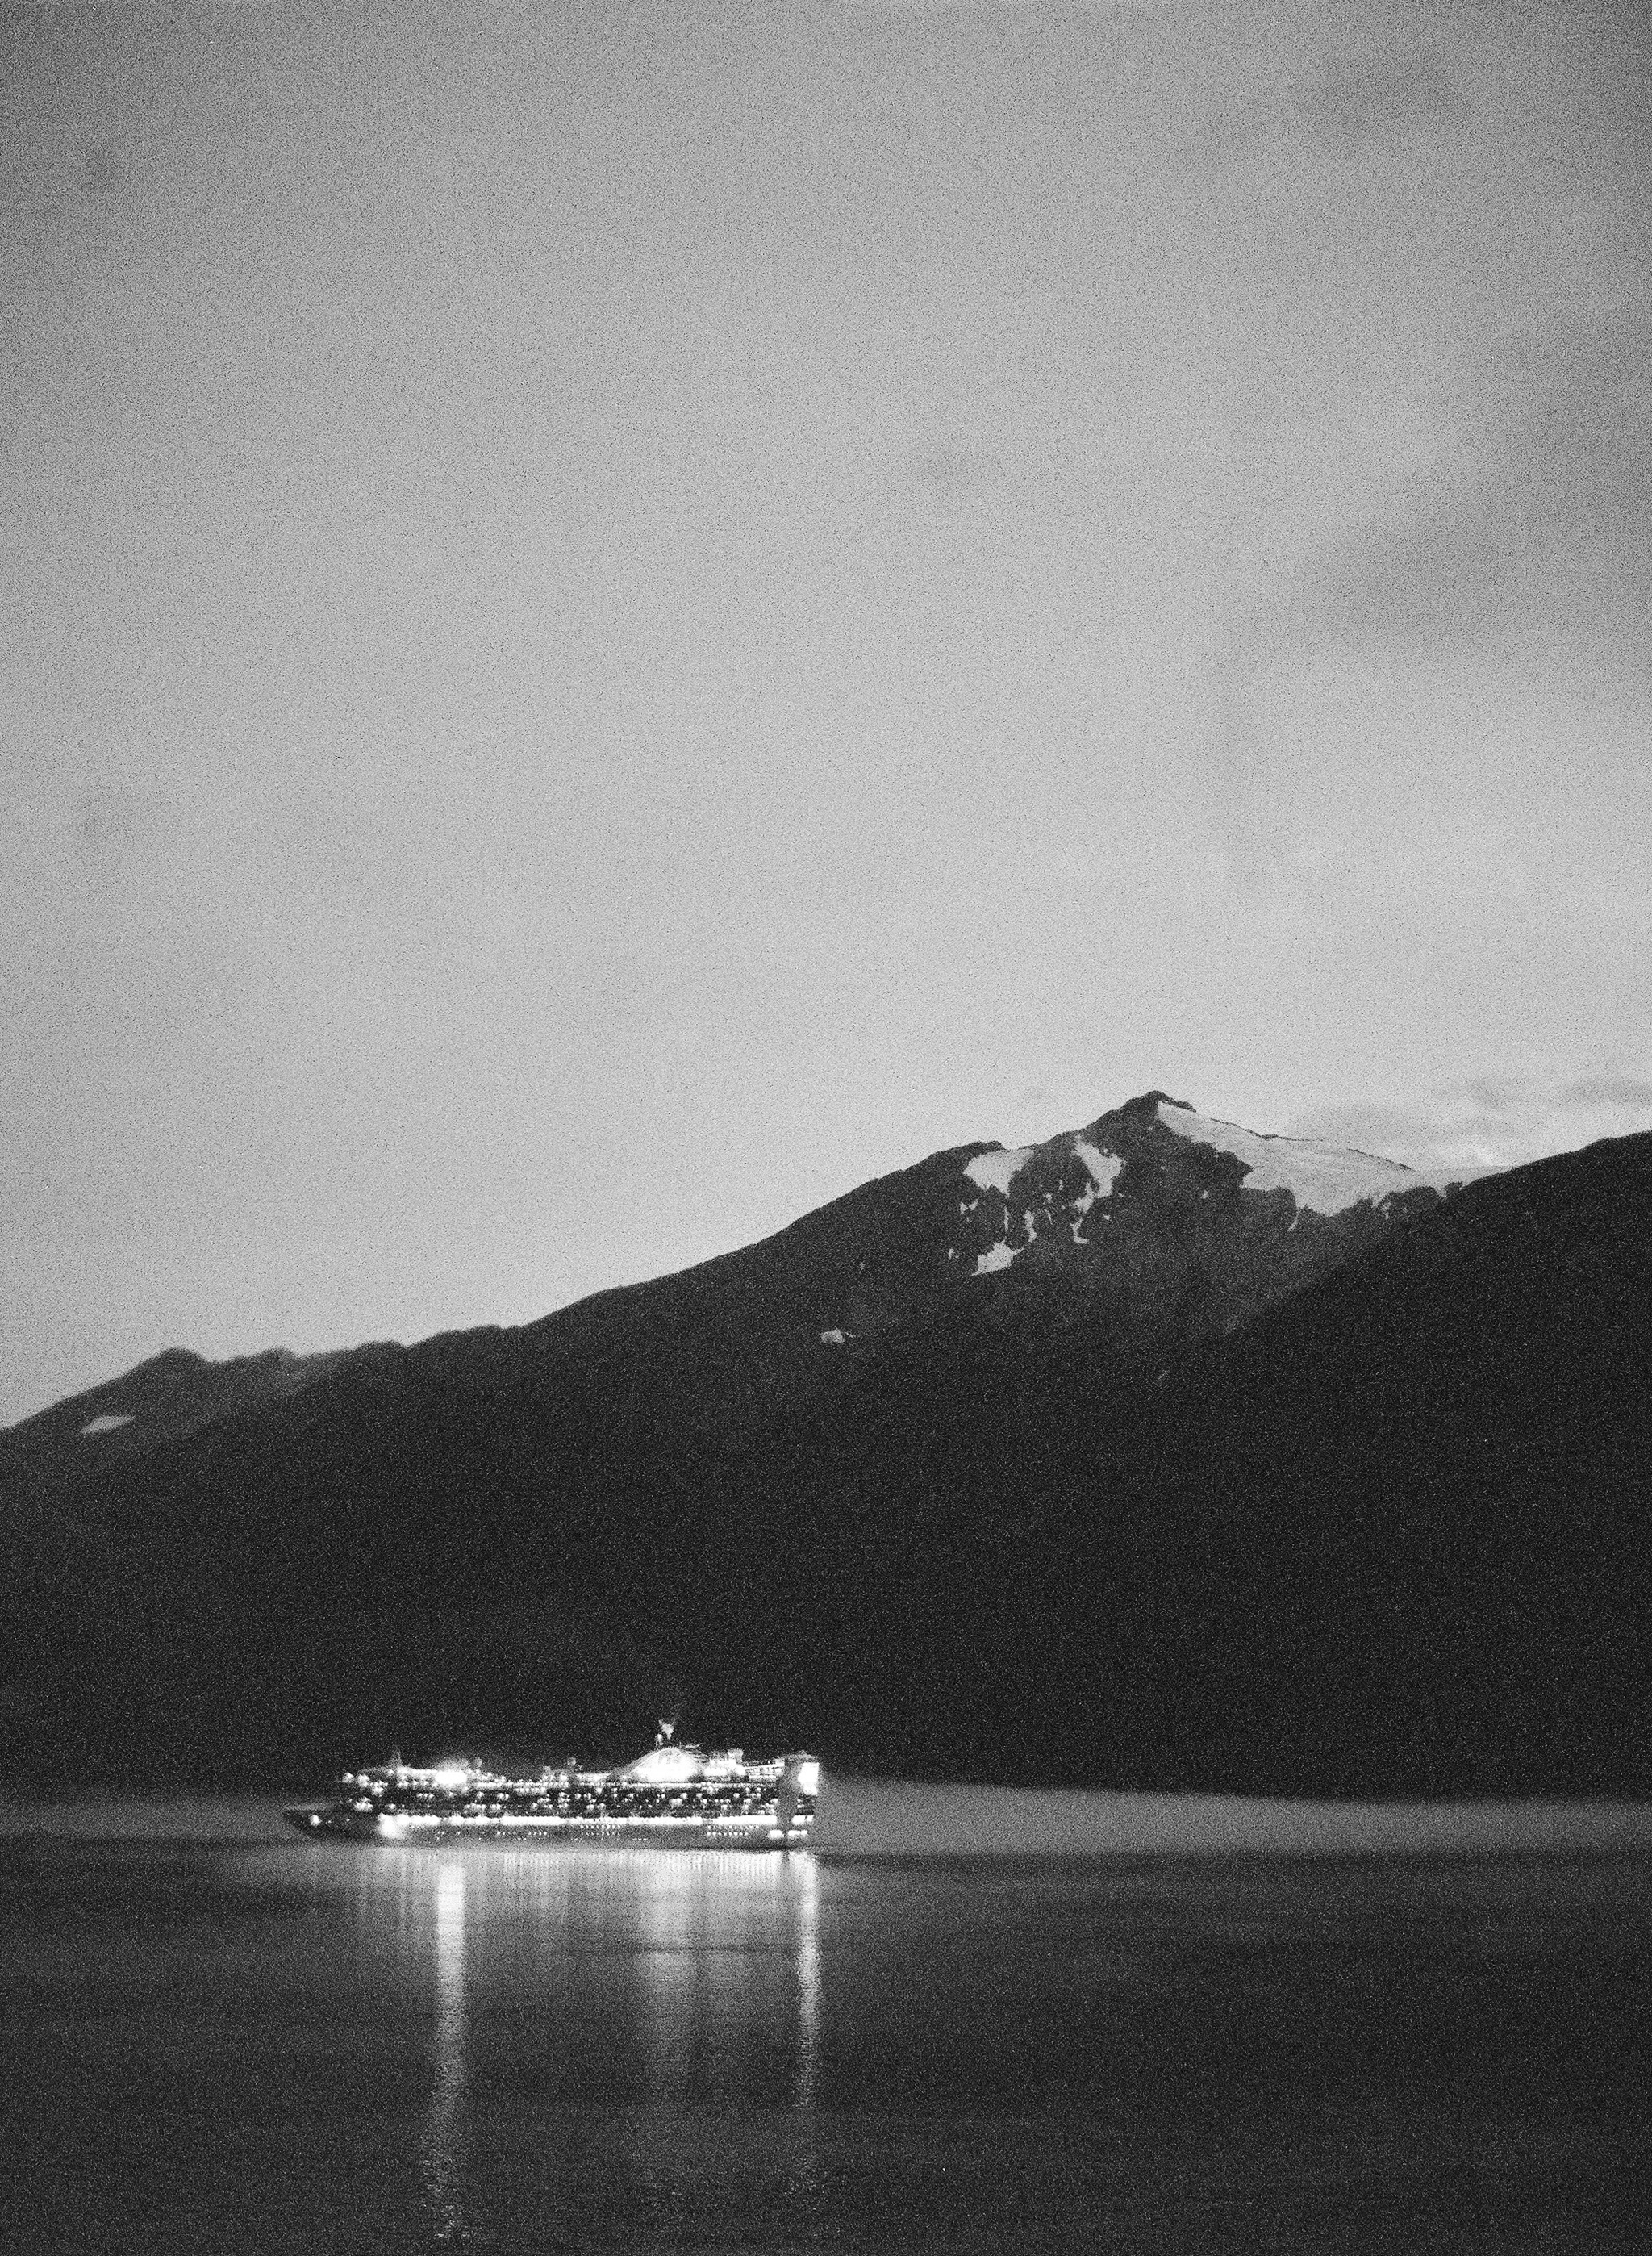 Alaska-Cruise-277-Jen_Huang-000001250004.jpg